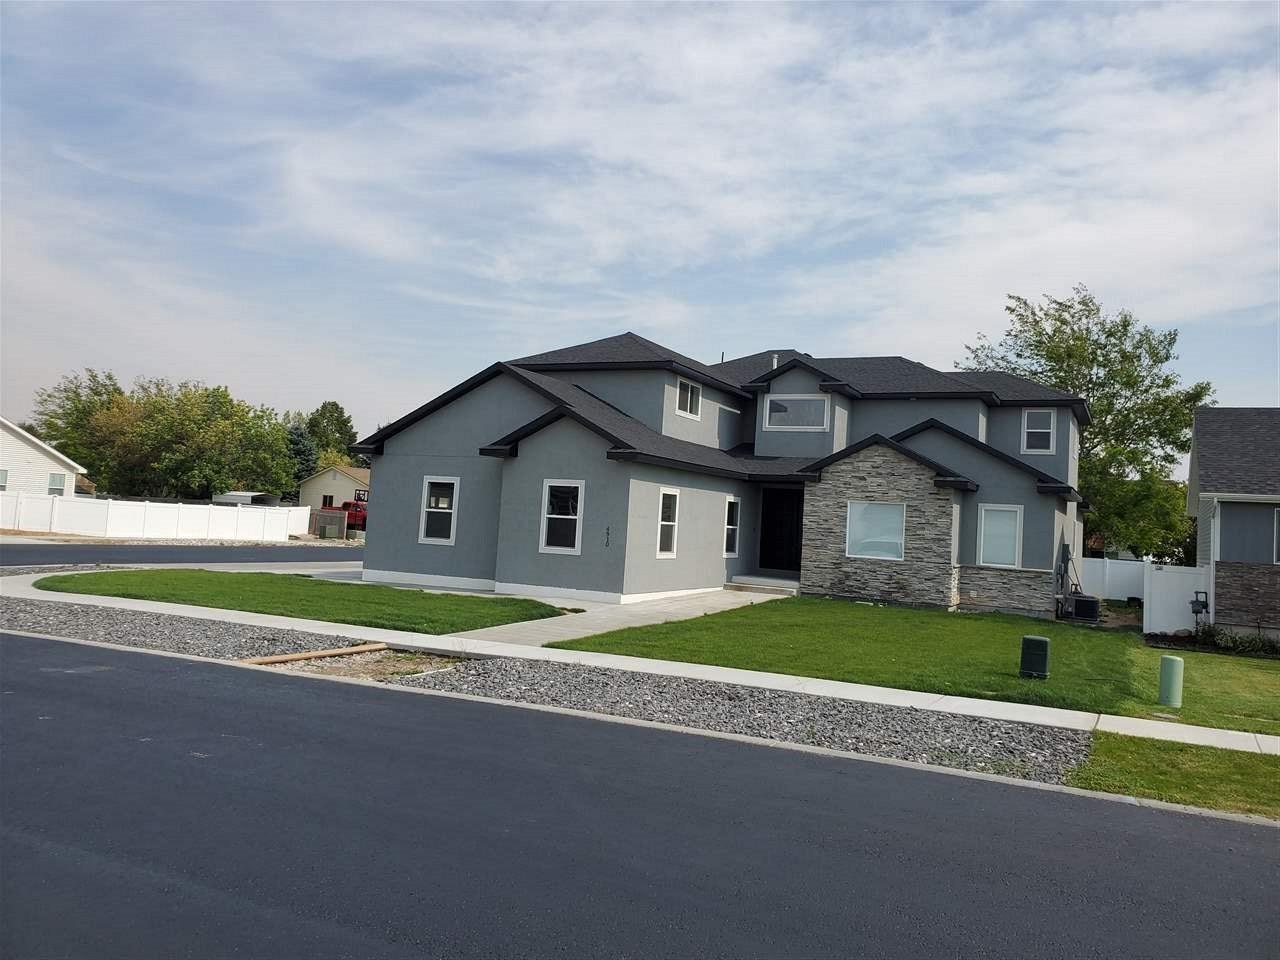 4910 Jake Property Photo - Chubbuck, ID real estate listing